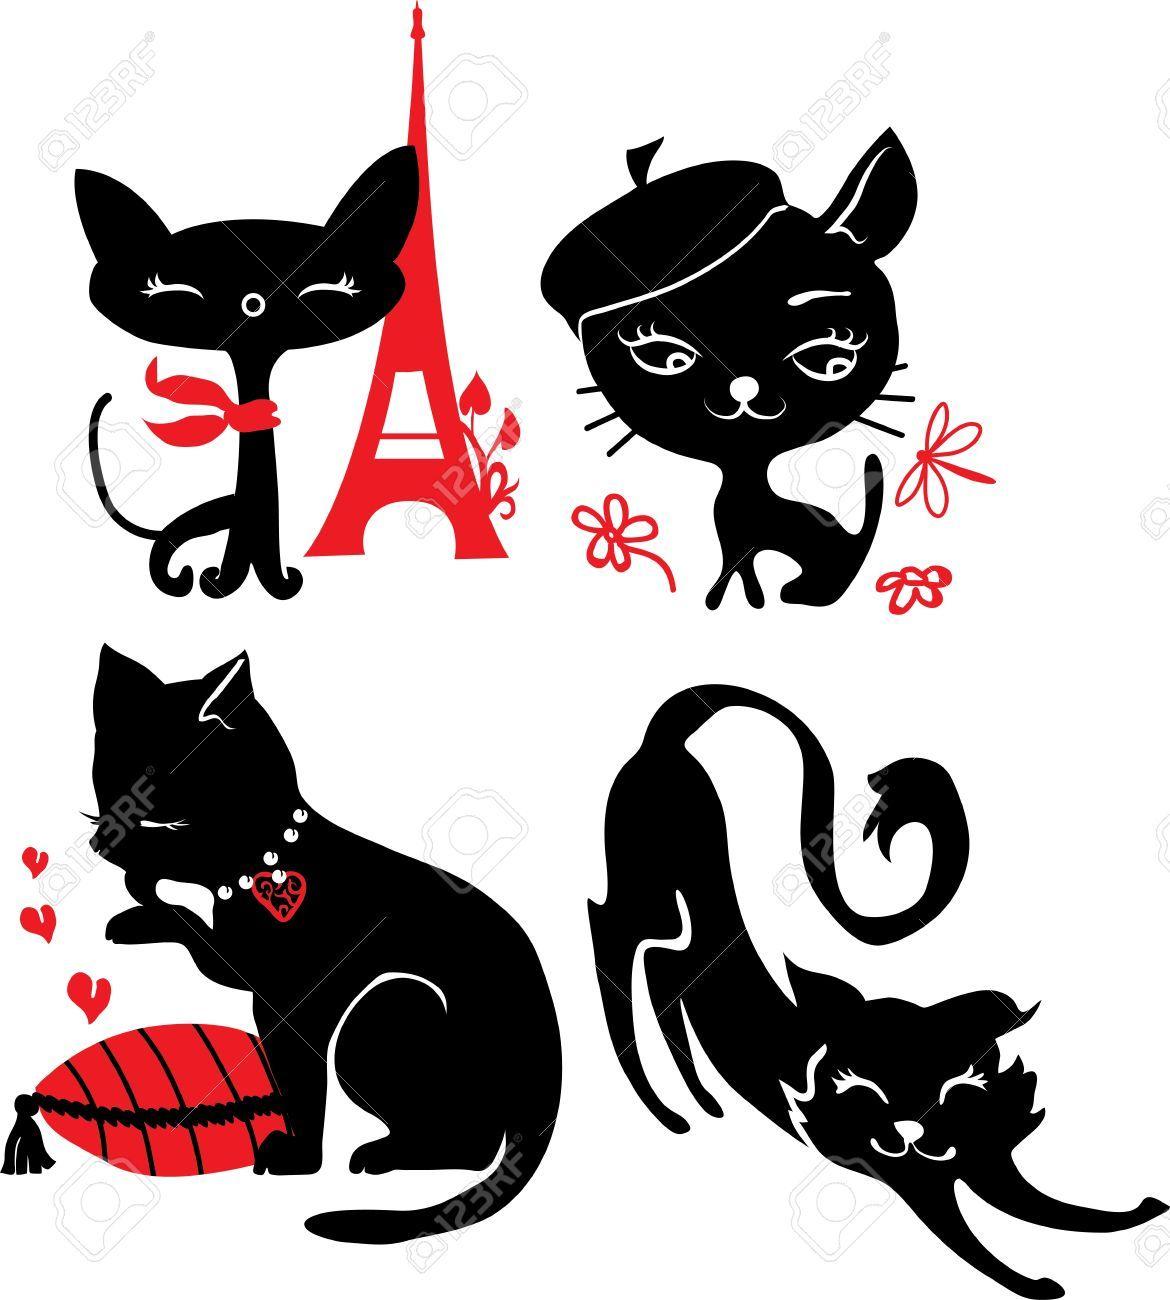 siluetas de gatos enamorados - Buscar con Google